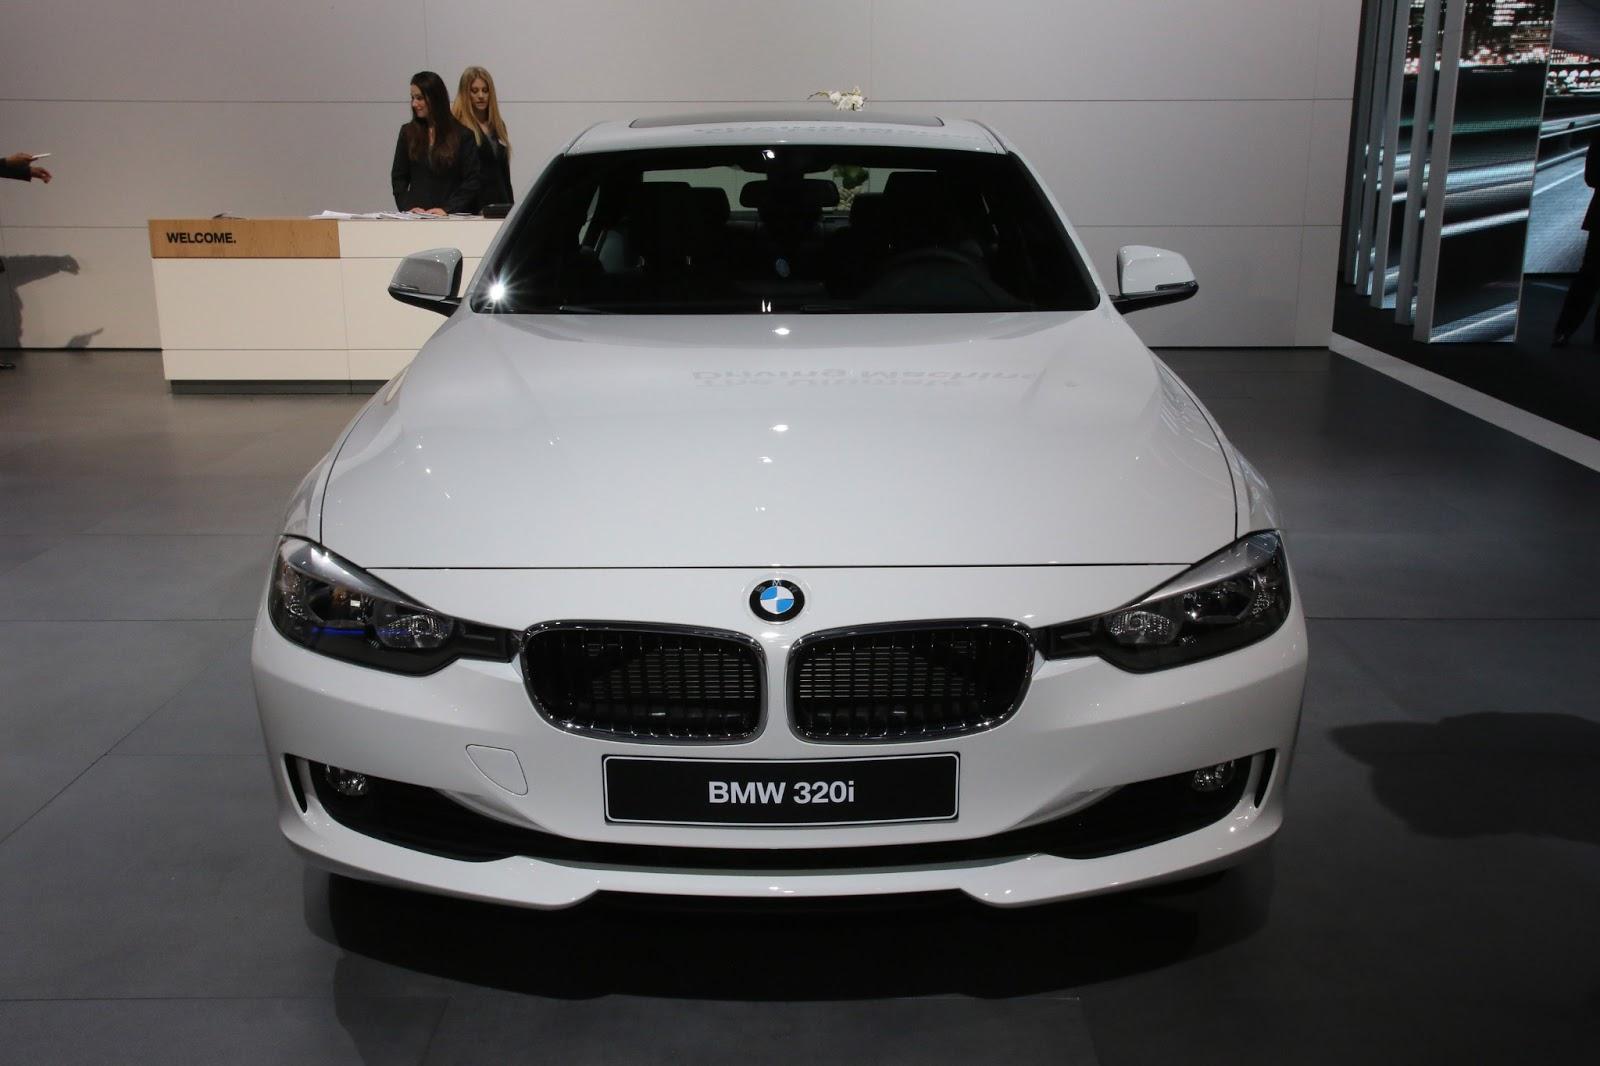 BMW 320i Detroit Free Download Image Of